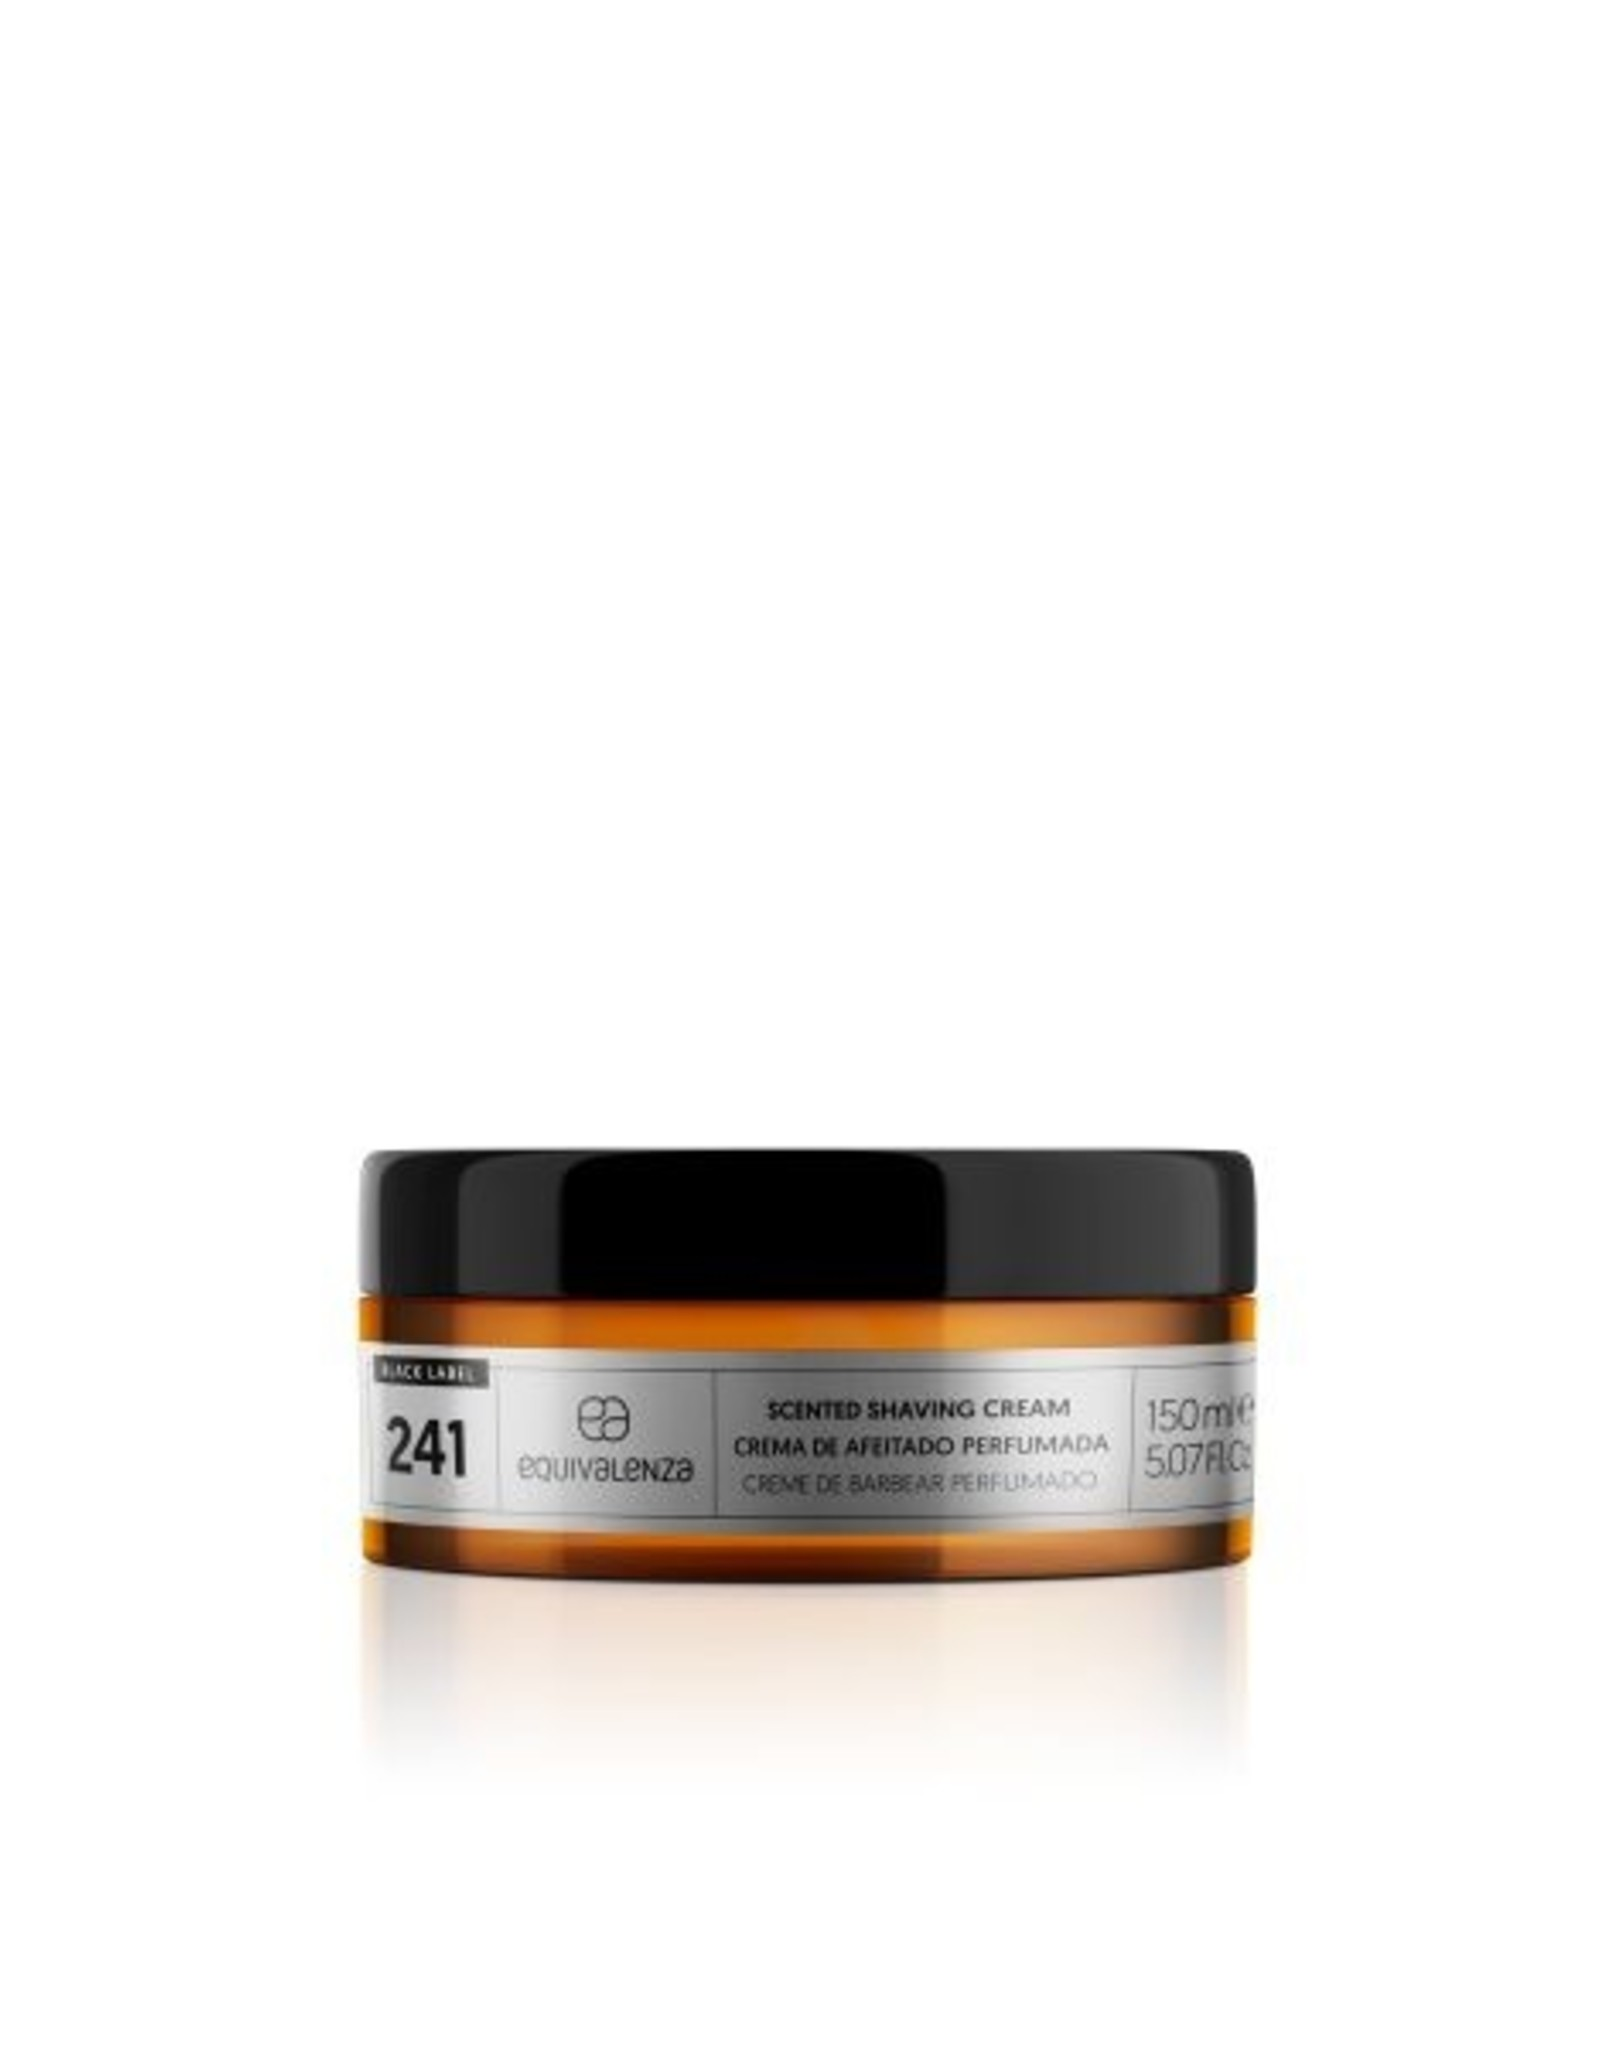 Equivalenza Black Label Shaving Cream 241